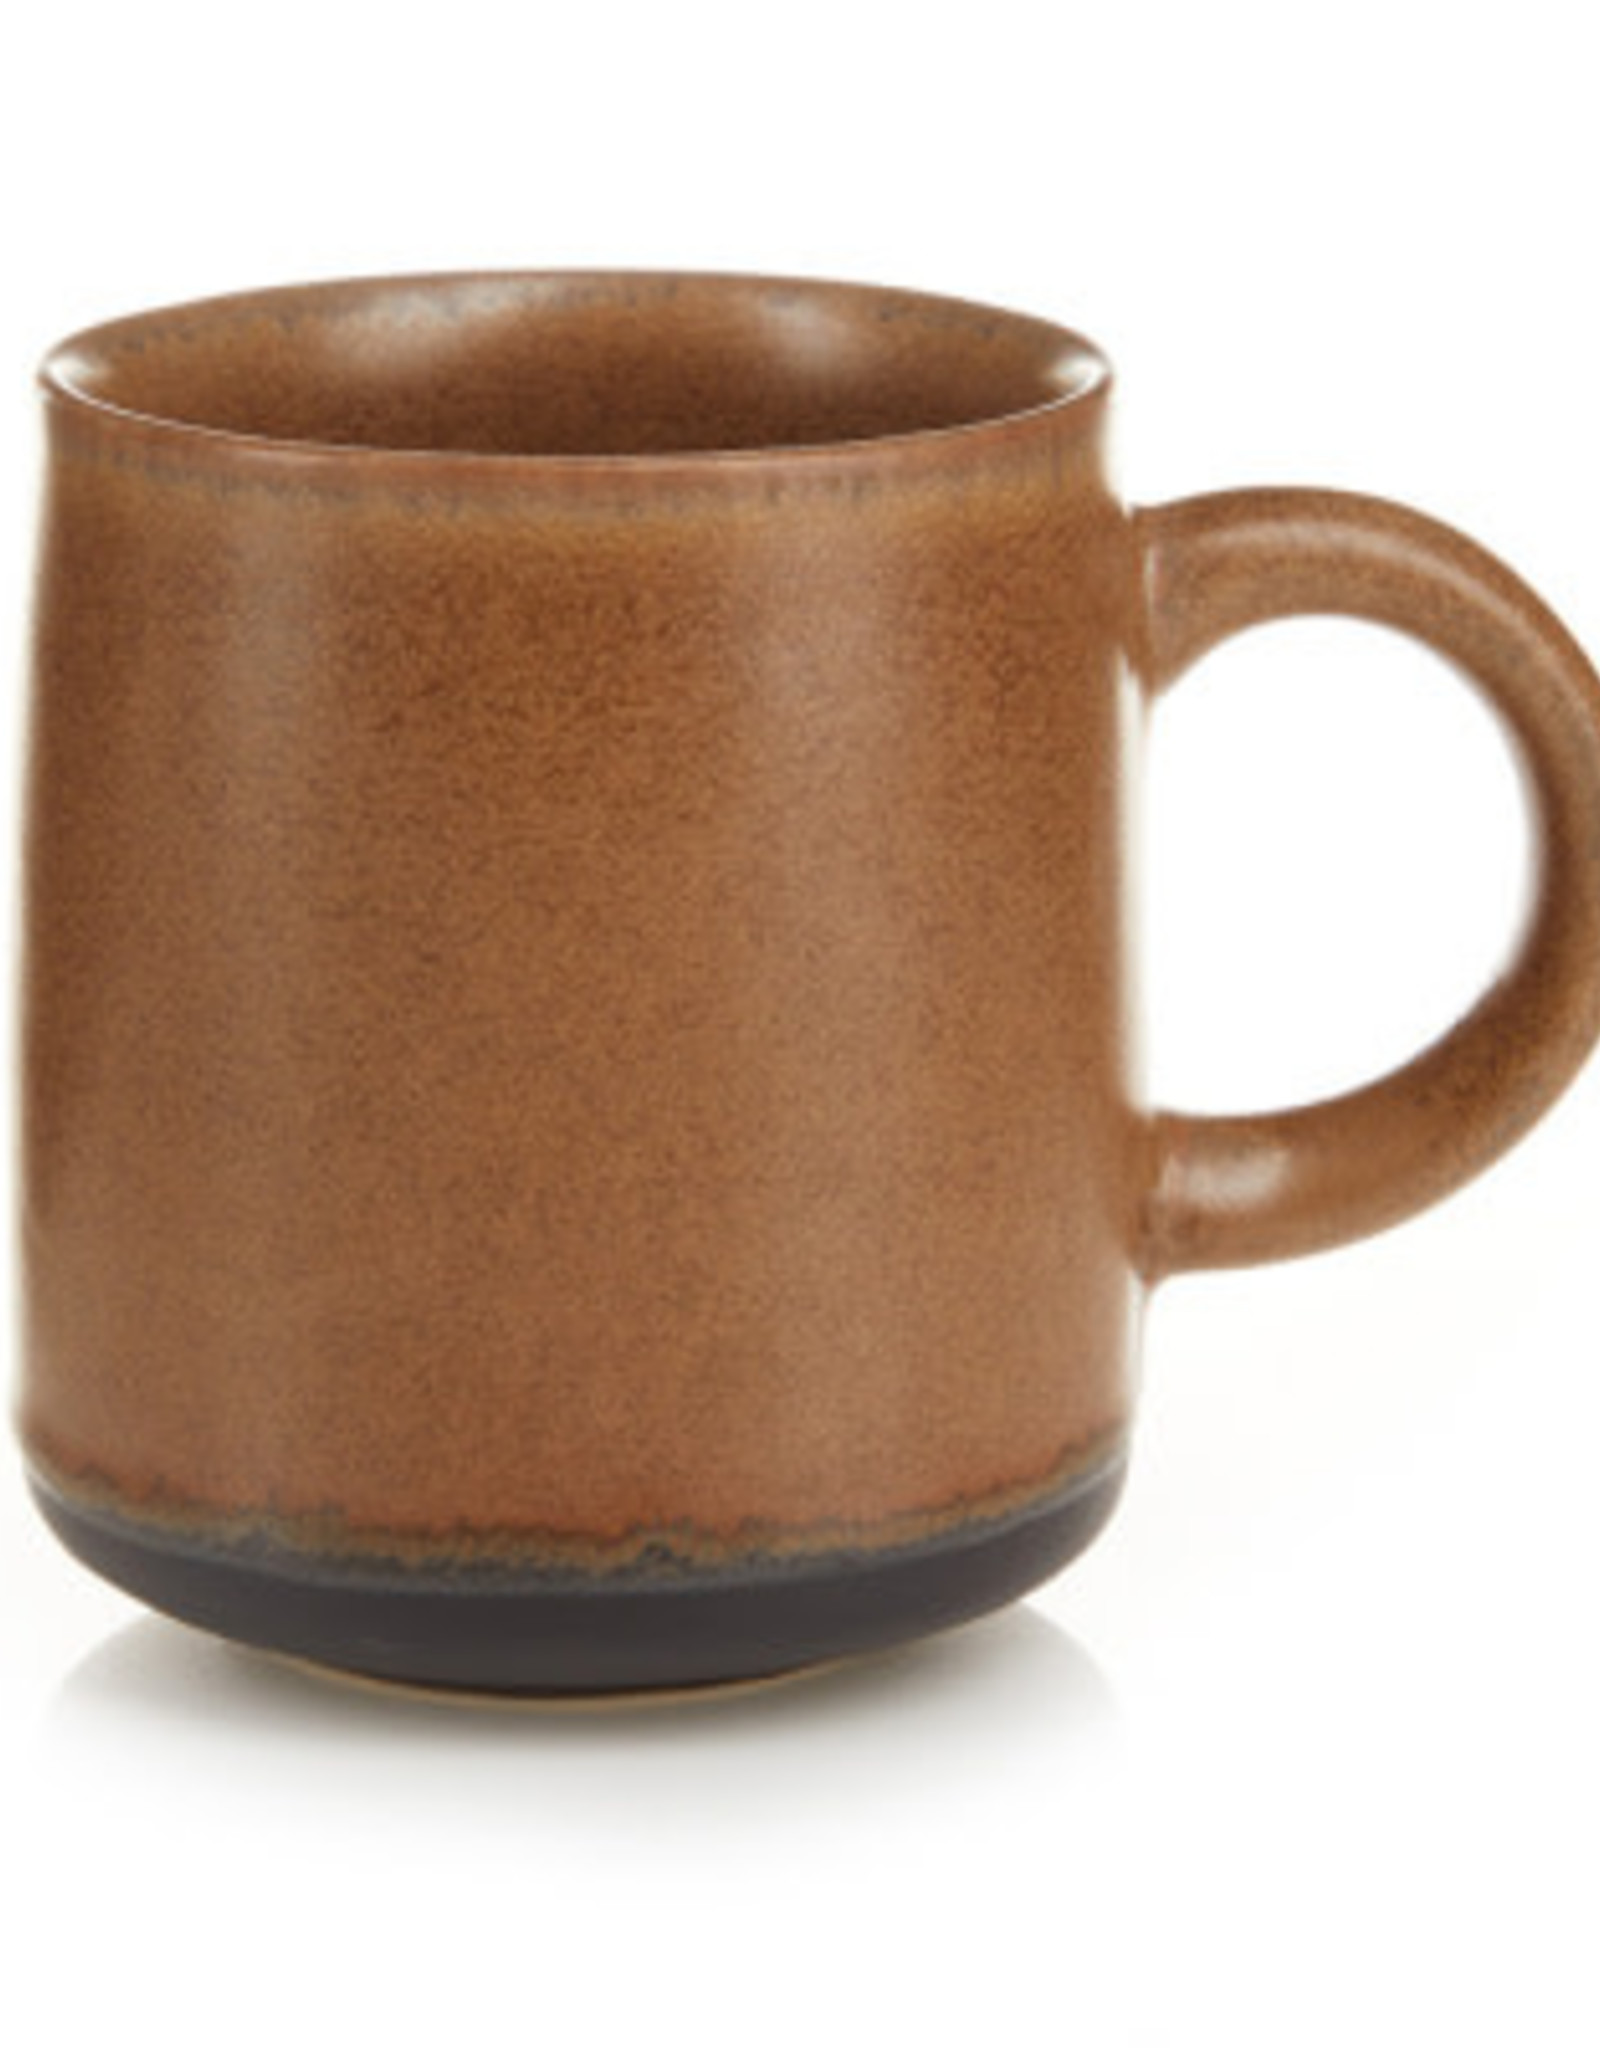 Farmhouse Mug, Sand